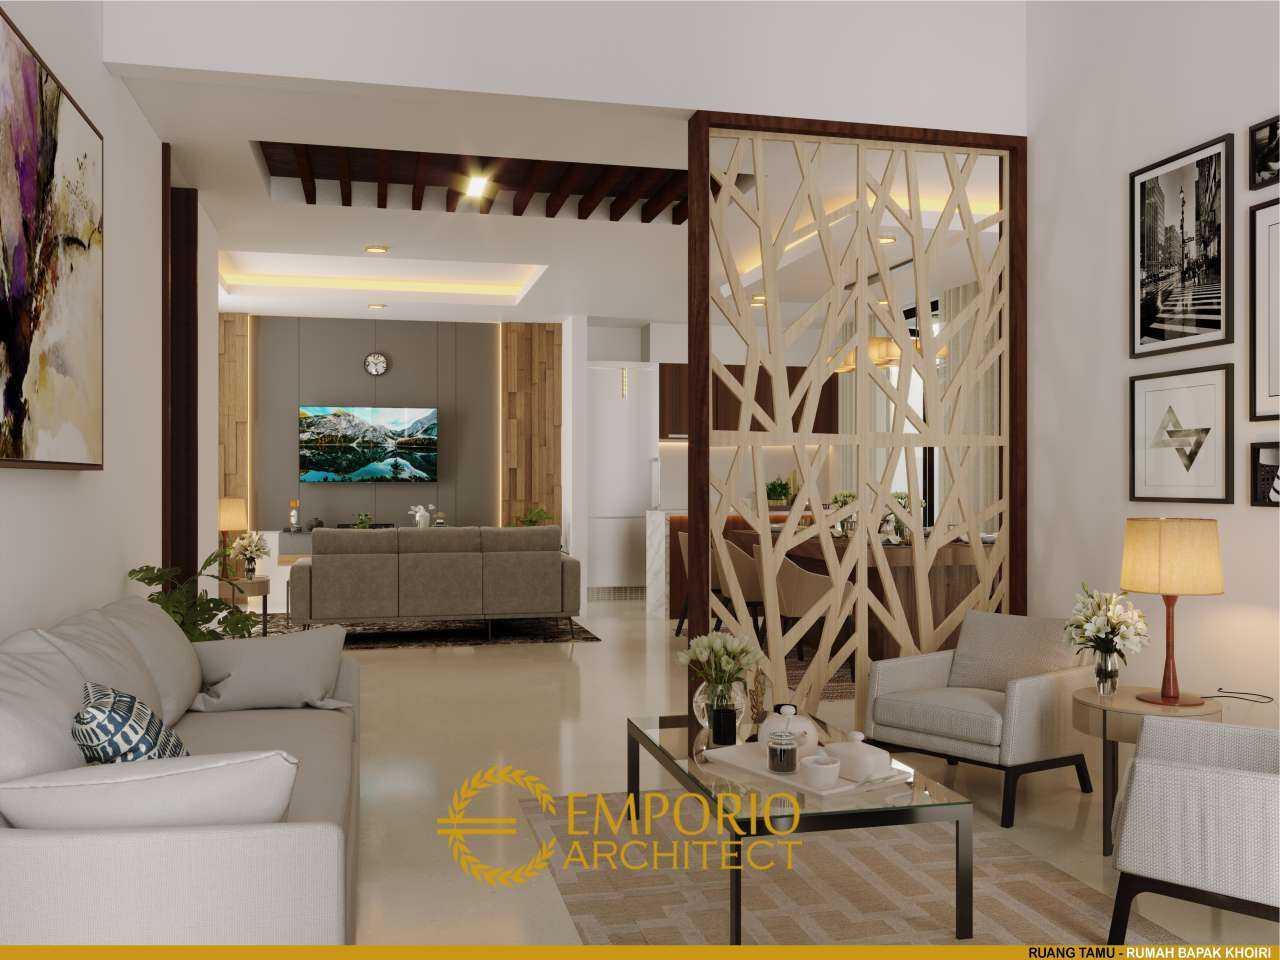 Emporio Architect Jasa Arsitek Cibubur Desain Rumah Modern 2 Lantai 768 @ Cibubur, Bekasi Cibubur, Kec. Ciracas, Kota Jakarta Timur, Daerah Khusus Ibukota Jakarta, Indonesia Cibubur, Kec. Ciracas, Kota Jakarta Timur, Daerah Khusus Ibukota Jakarta, Indonesia Emporio-Architect-Jasa-Arsitek-Cibubur-Desain-Rumah-Modern-2-Lantai-768-Cibubur-Bekasi  87493